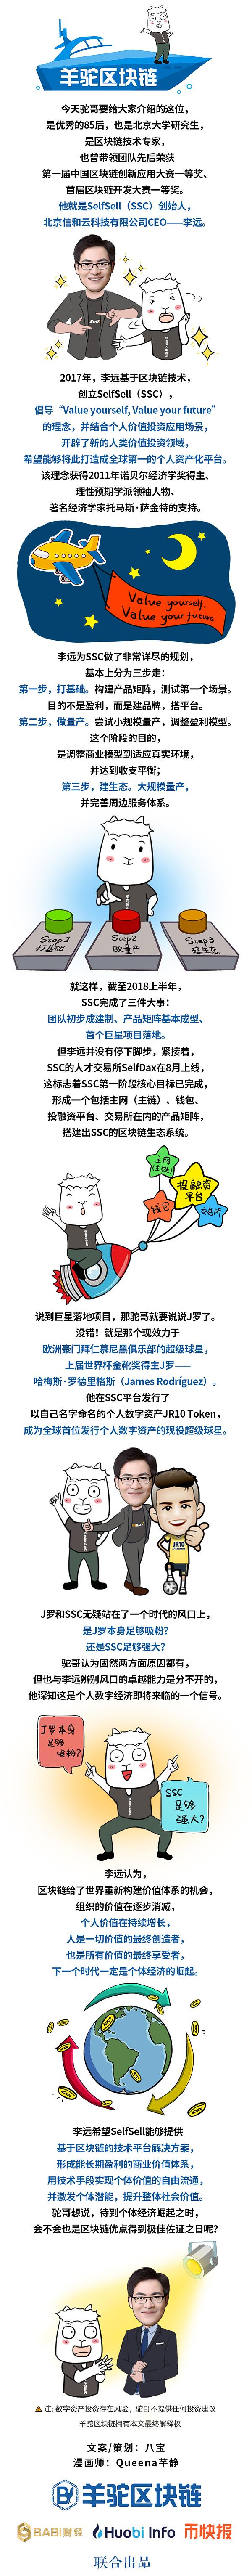 SSC创始人李远与他的个体经济崛起论 怪不得超级球星J罗也选择他